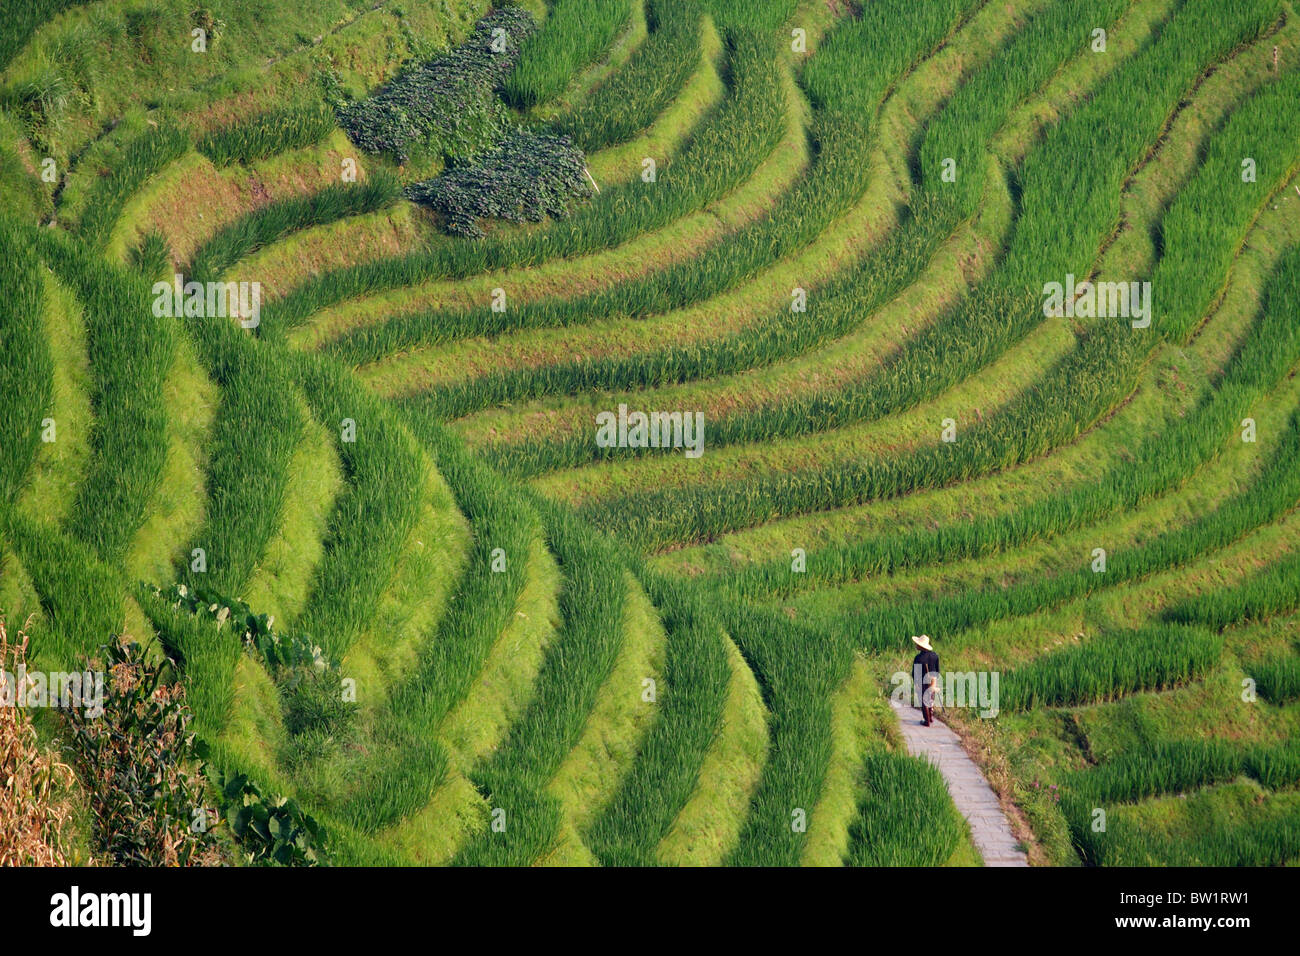 Chine - Dragon's backbone Rice Terraces Photo Stock